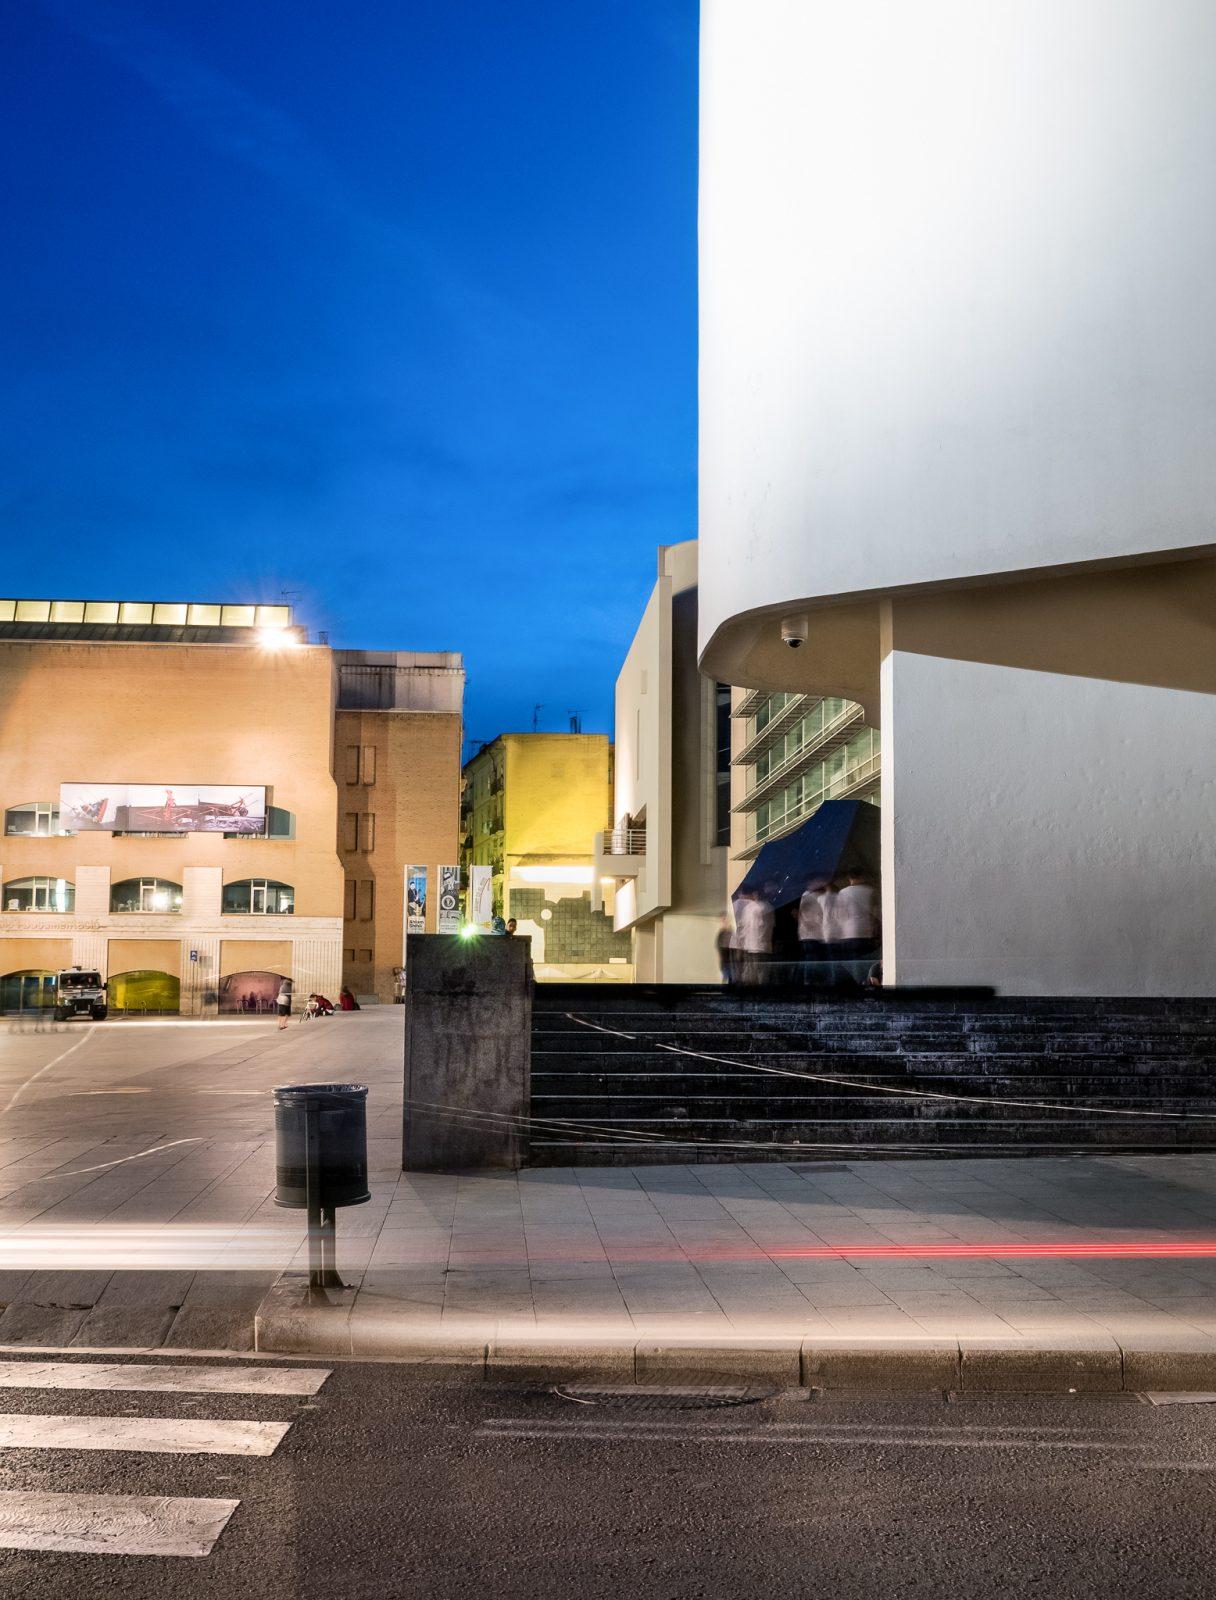 Museu d'Art Contemporani de Barcelona, MACBA